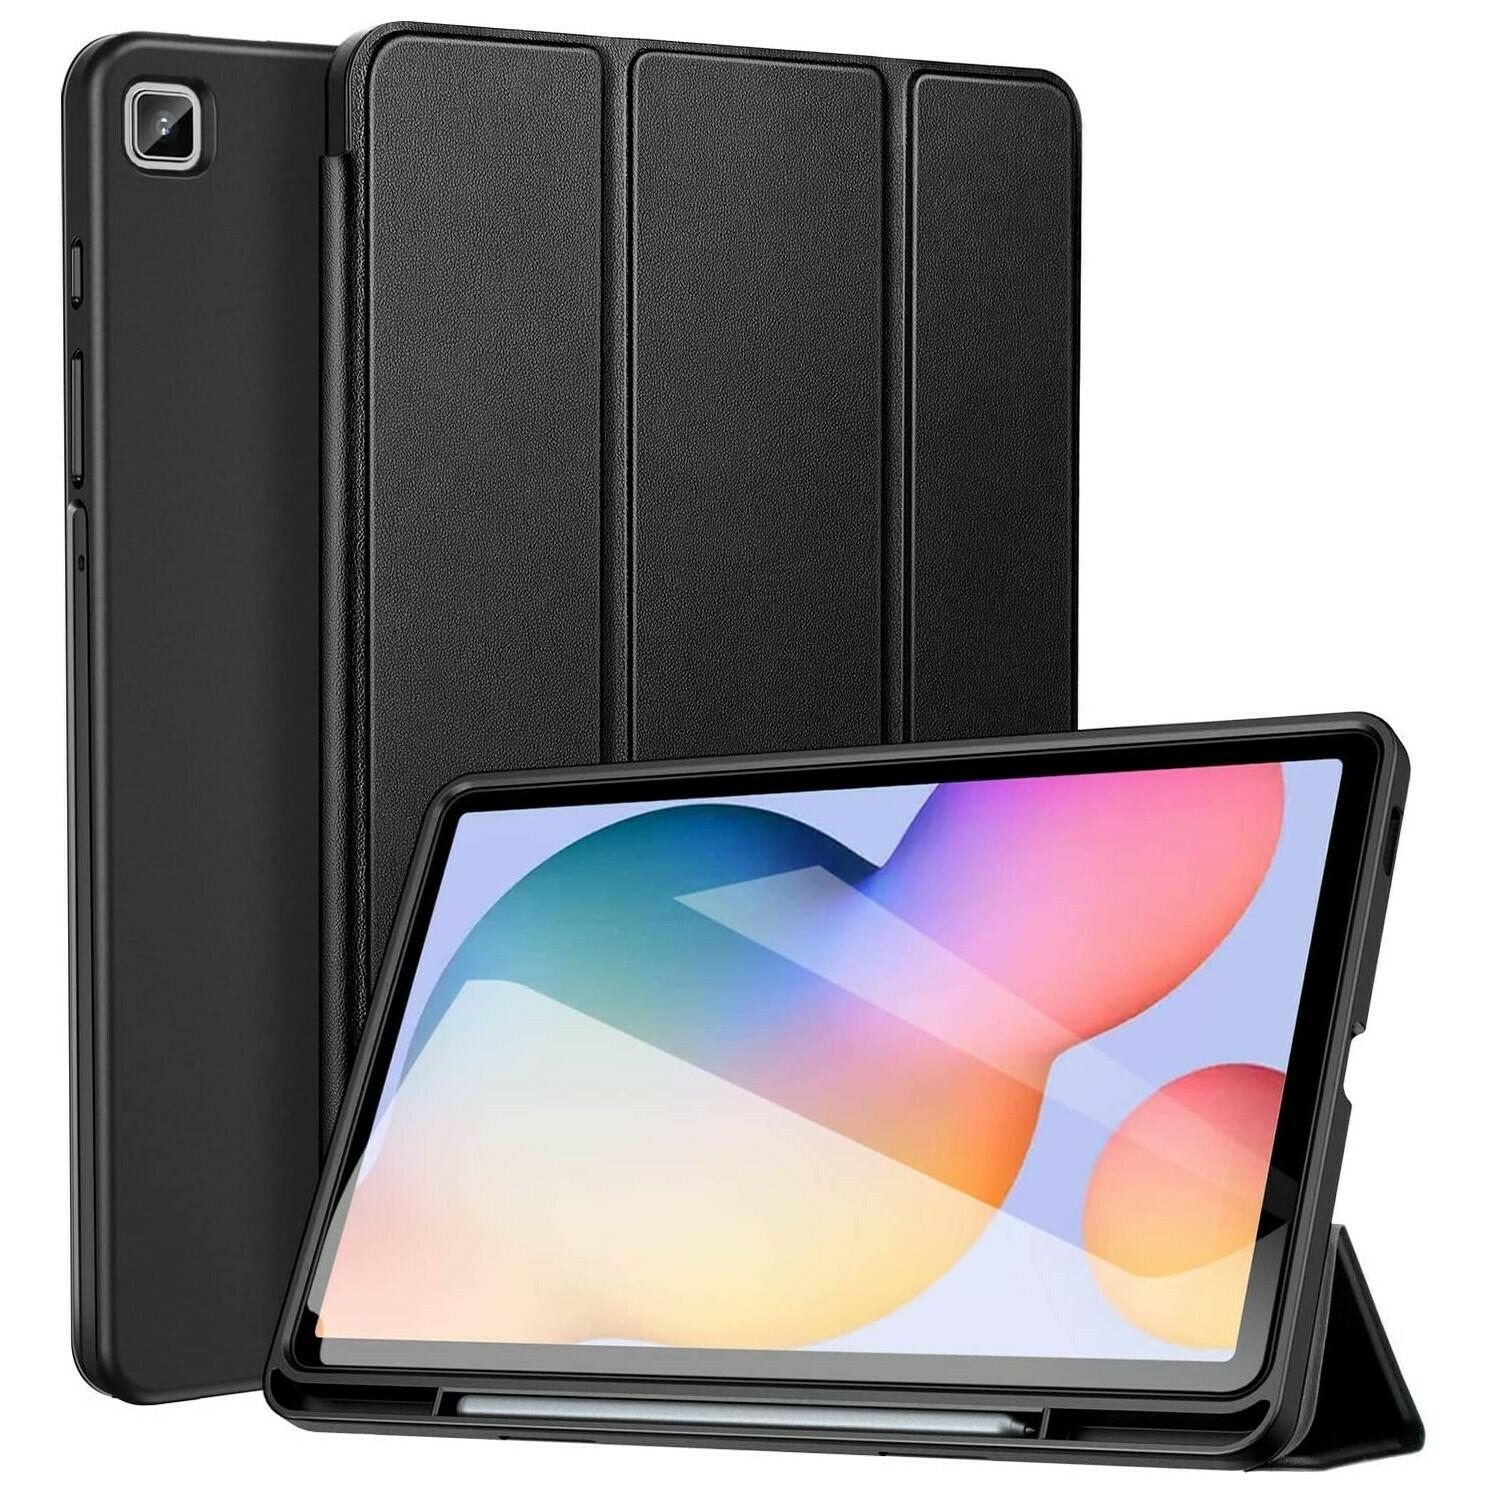 Funda Flip Samsung Galaxy Tab S6 Lite 10.4 SM-P610/P615 Tapa Magnética c/ Porta Lápiz Interno